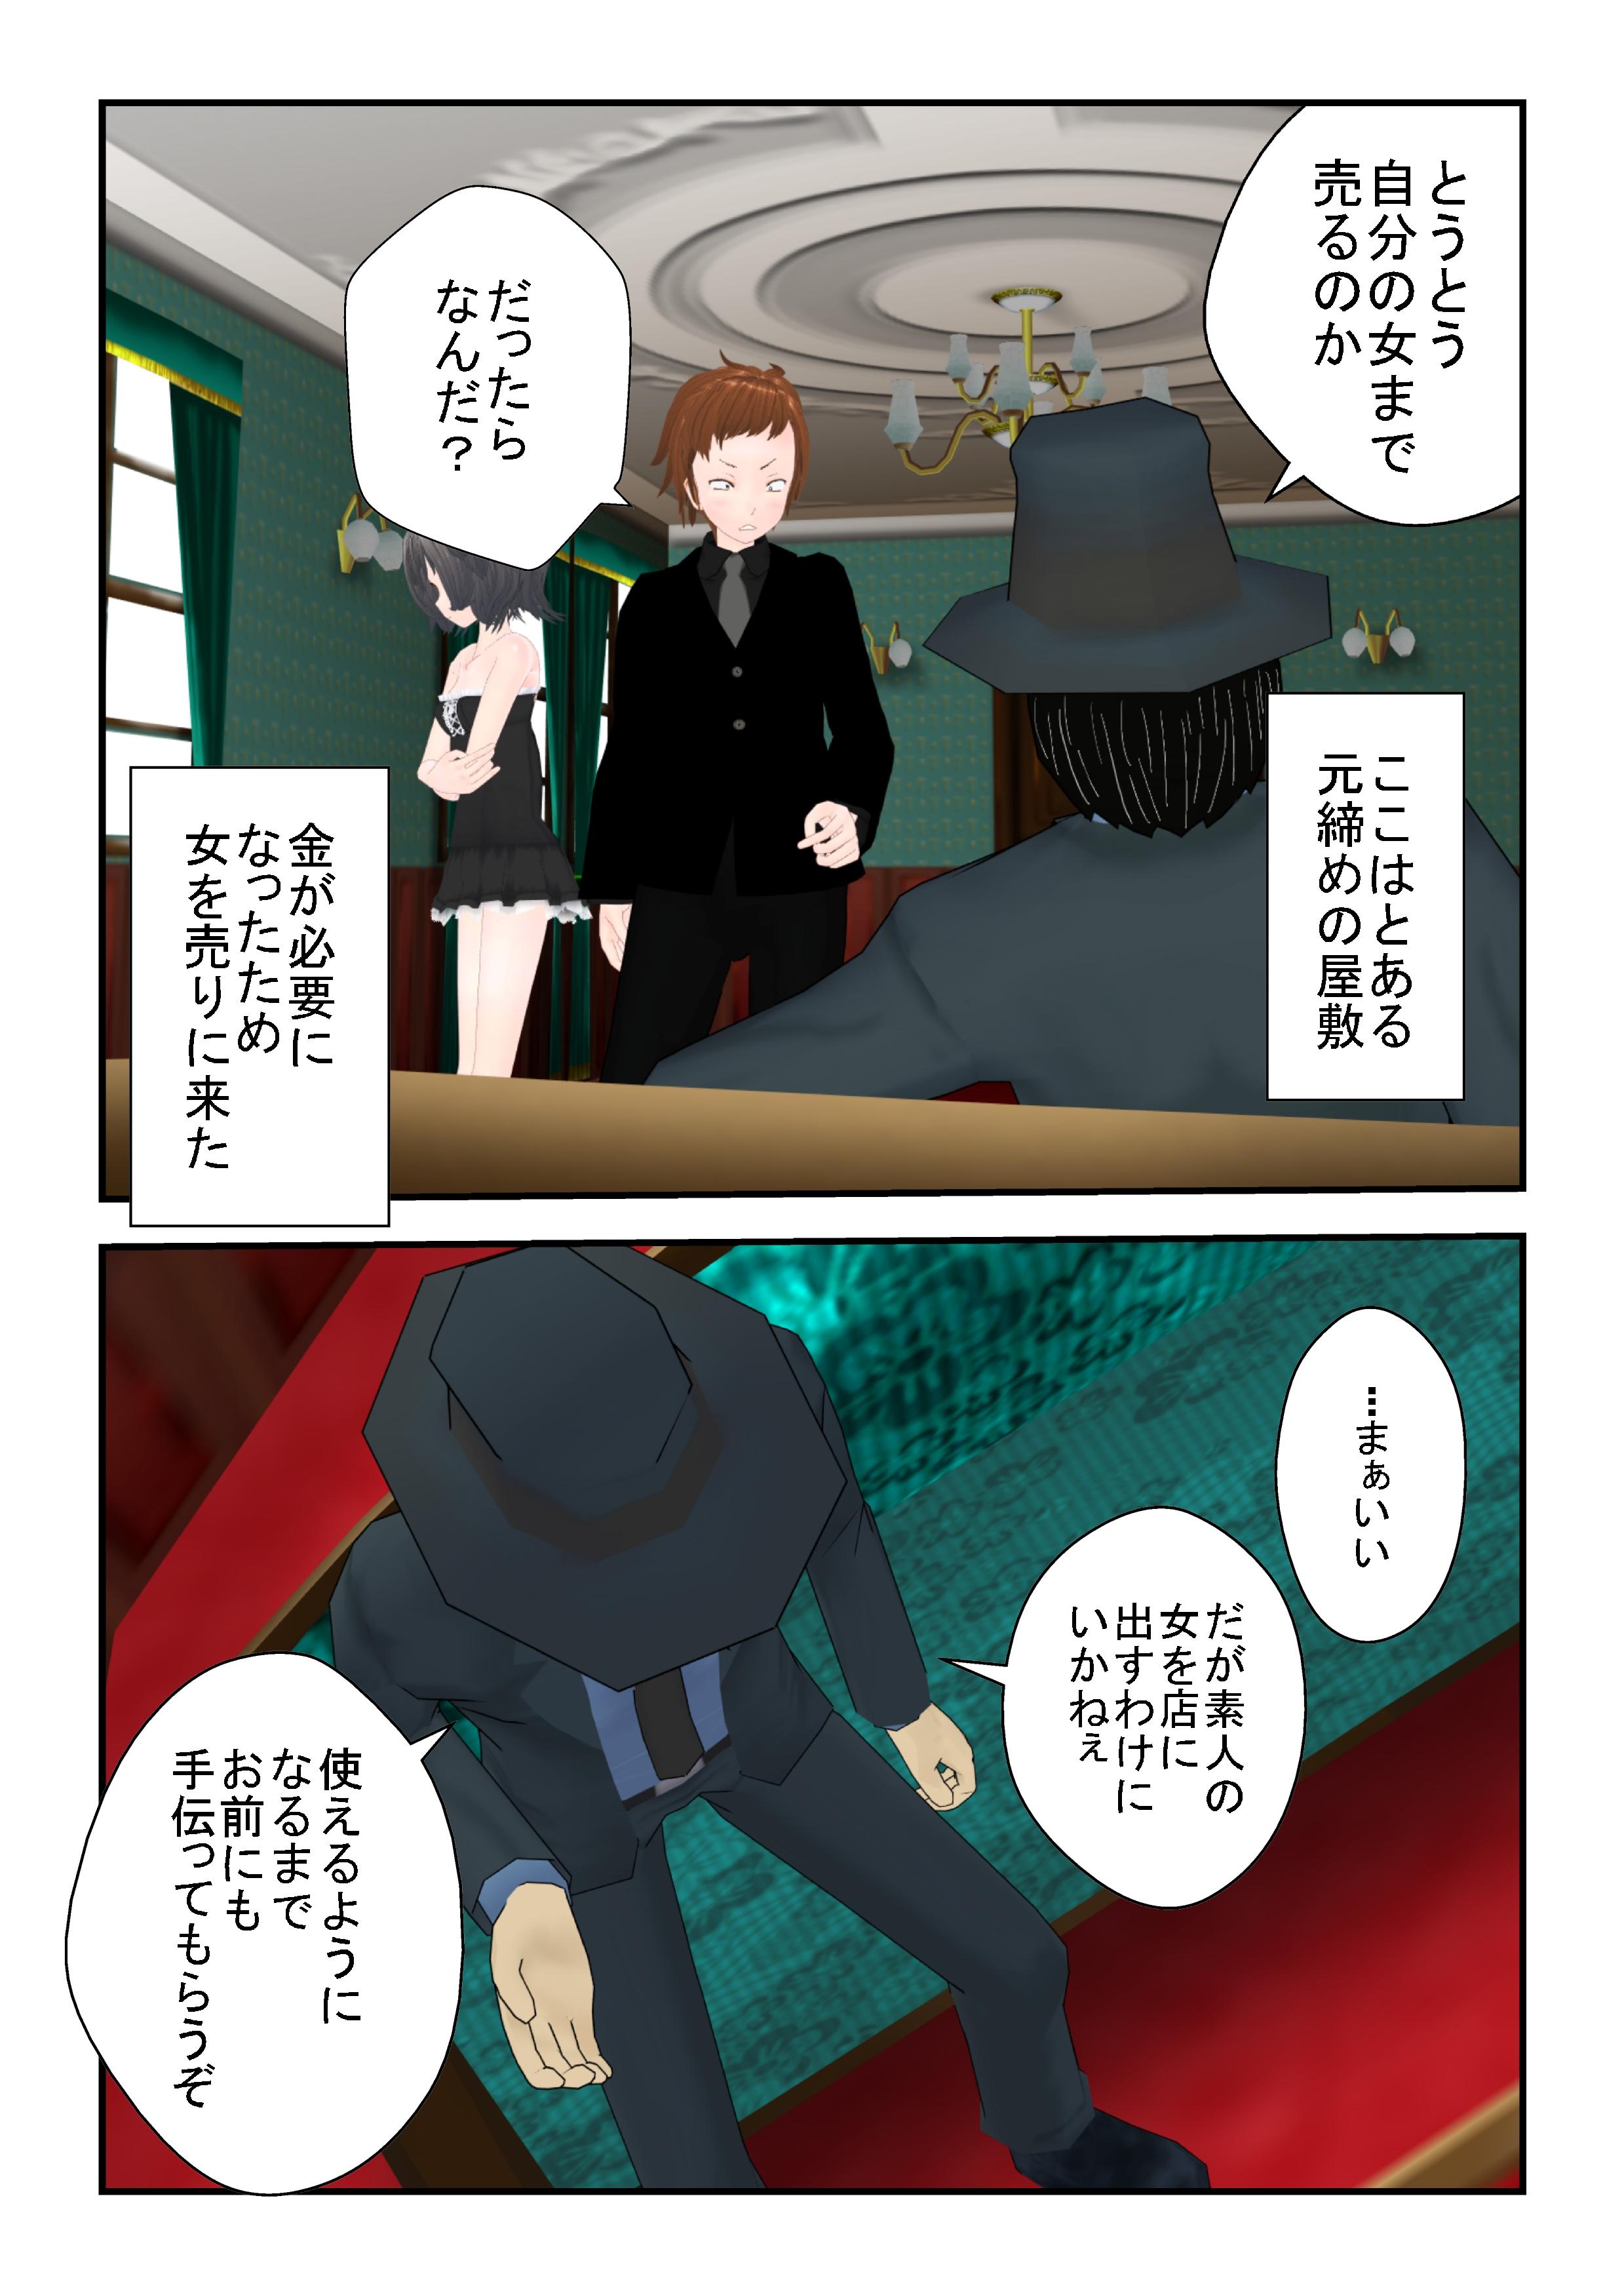 shi_0001_2.jpg